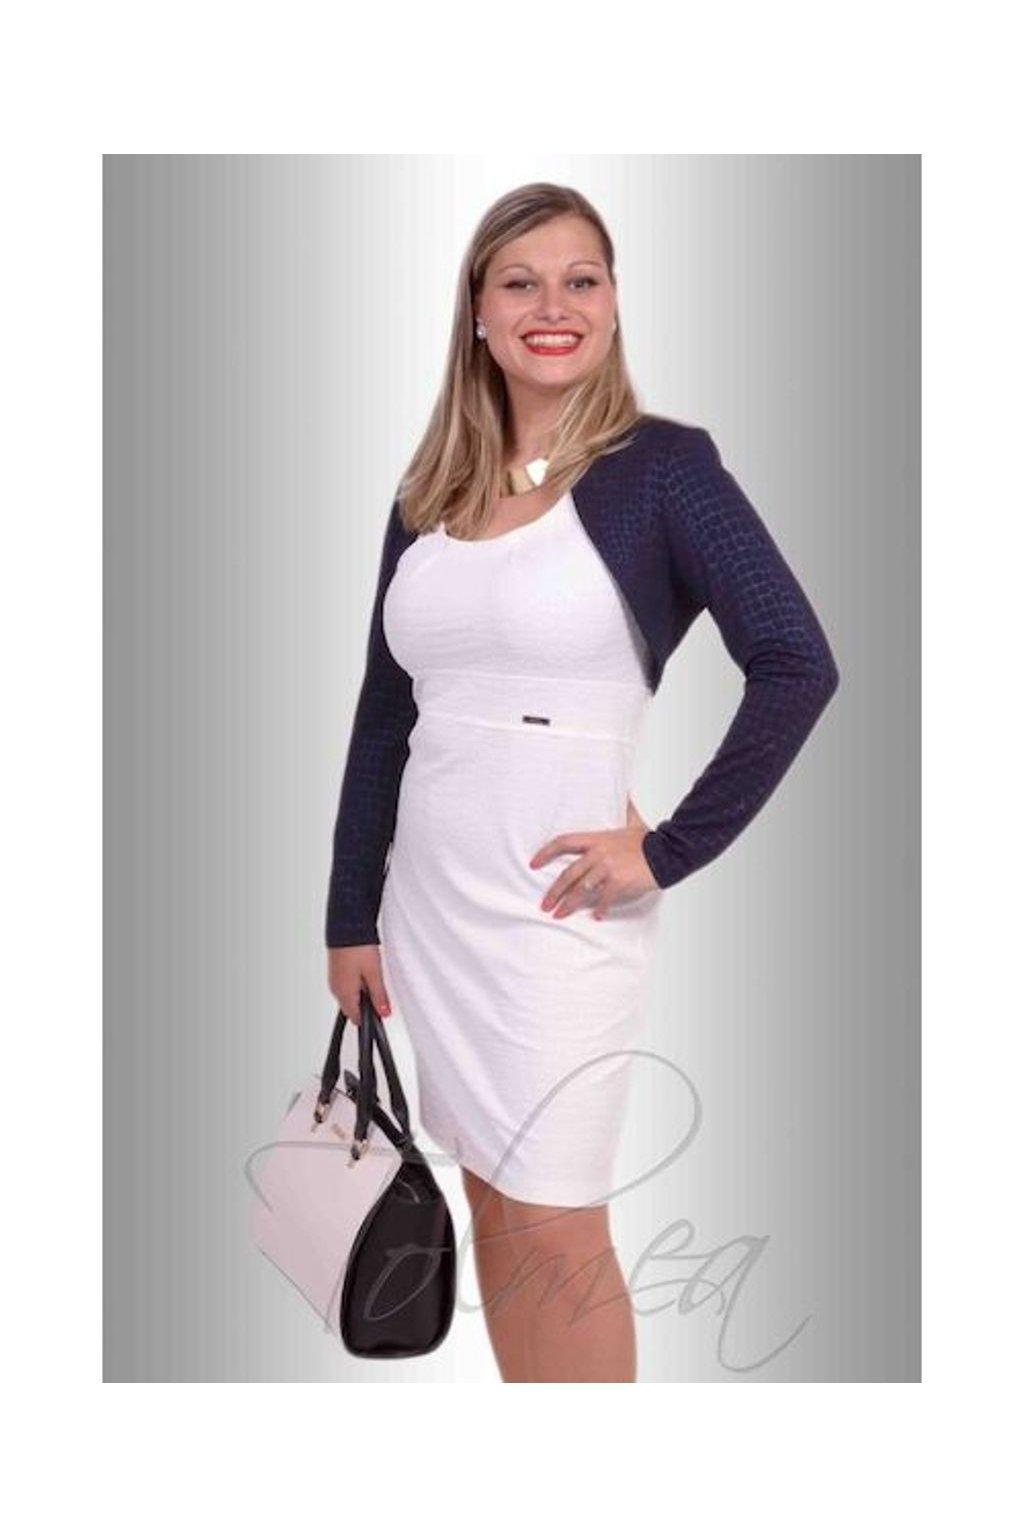 Šaty a bolerko Ricky KS0415v5 (Velikost 36, Barva Bílá)